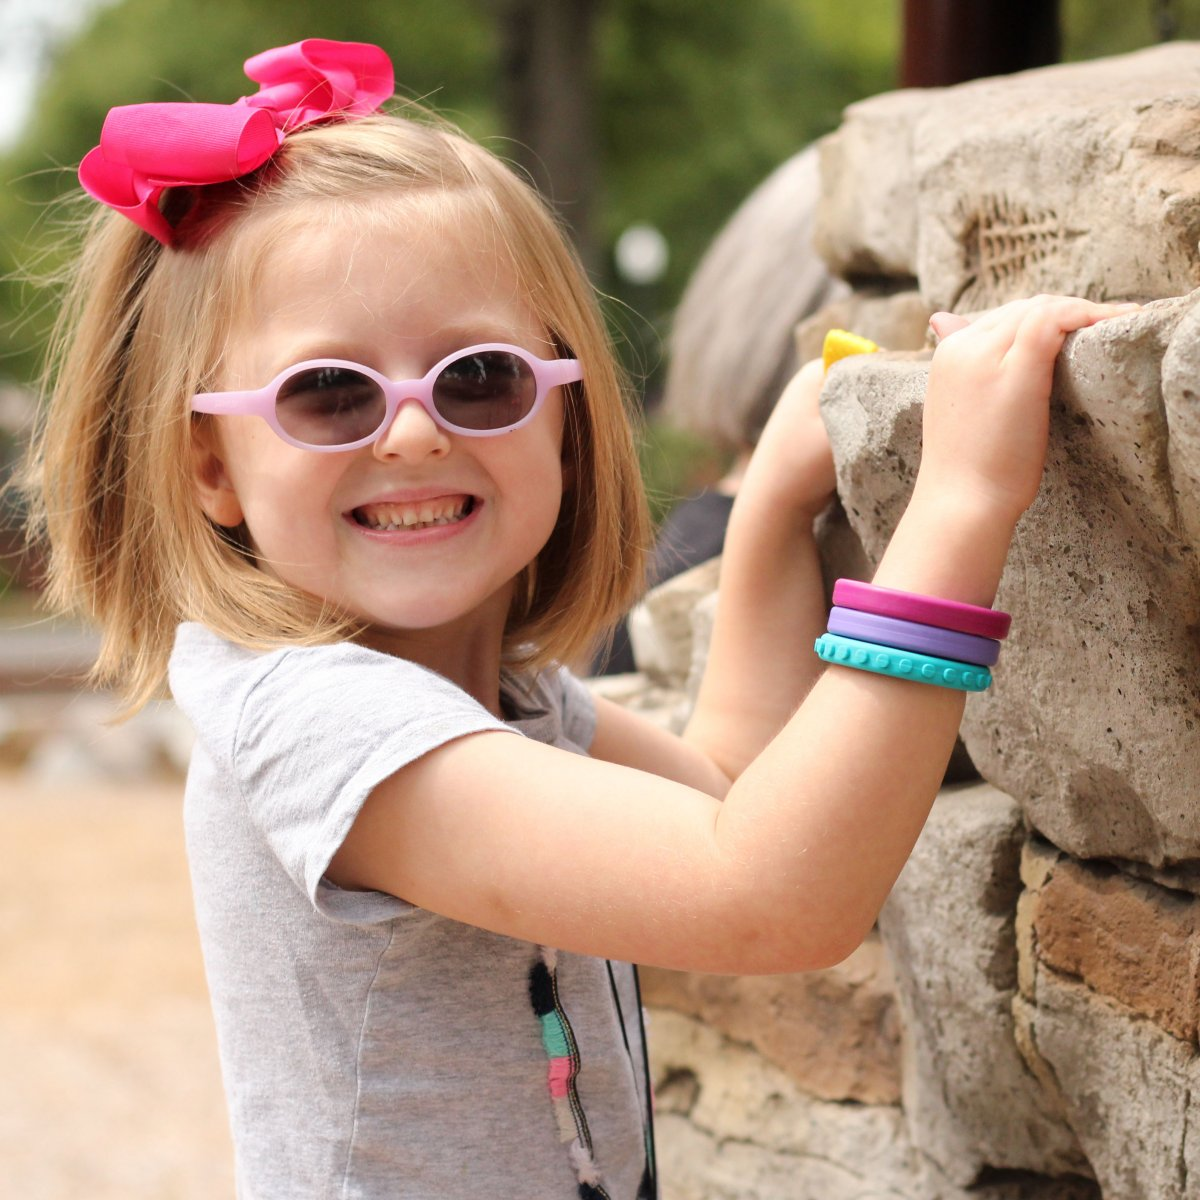 Tuggarmband Brick, liten barn Funkamera se